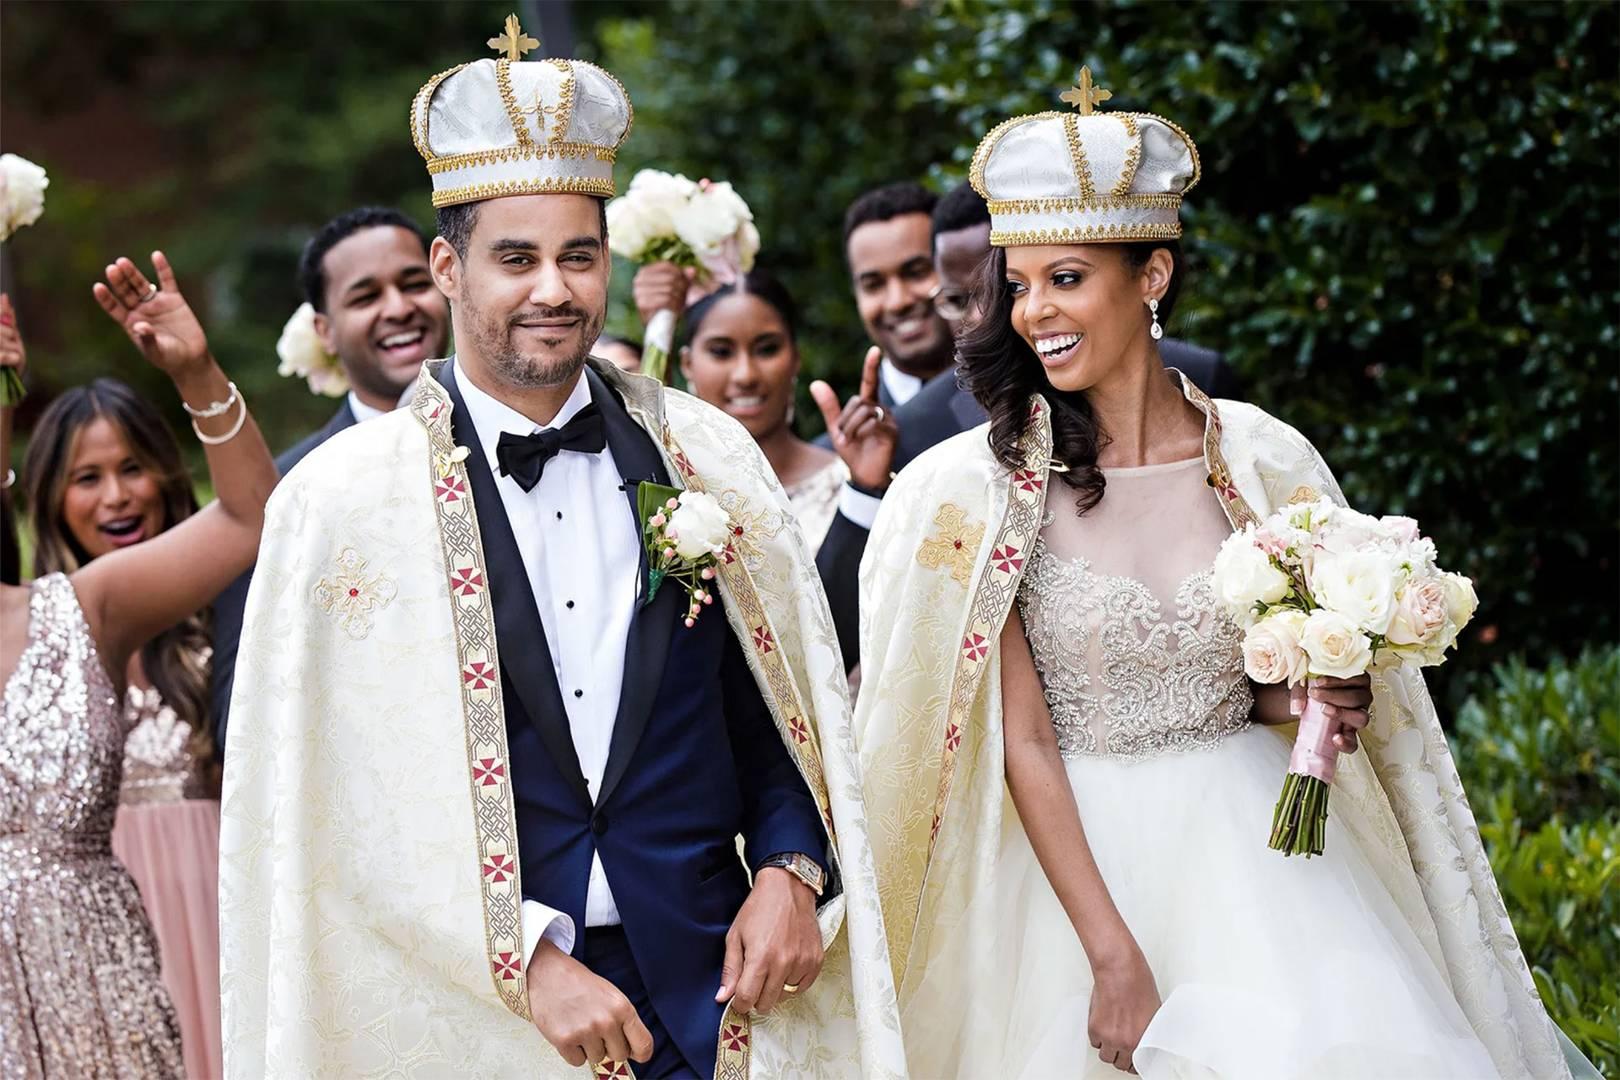 The most stylish Society brides | Tatler